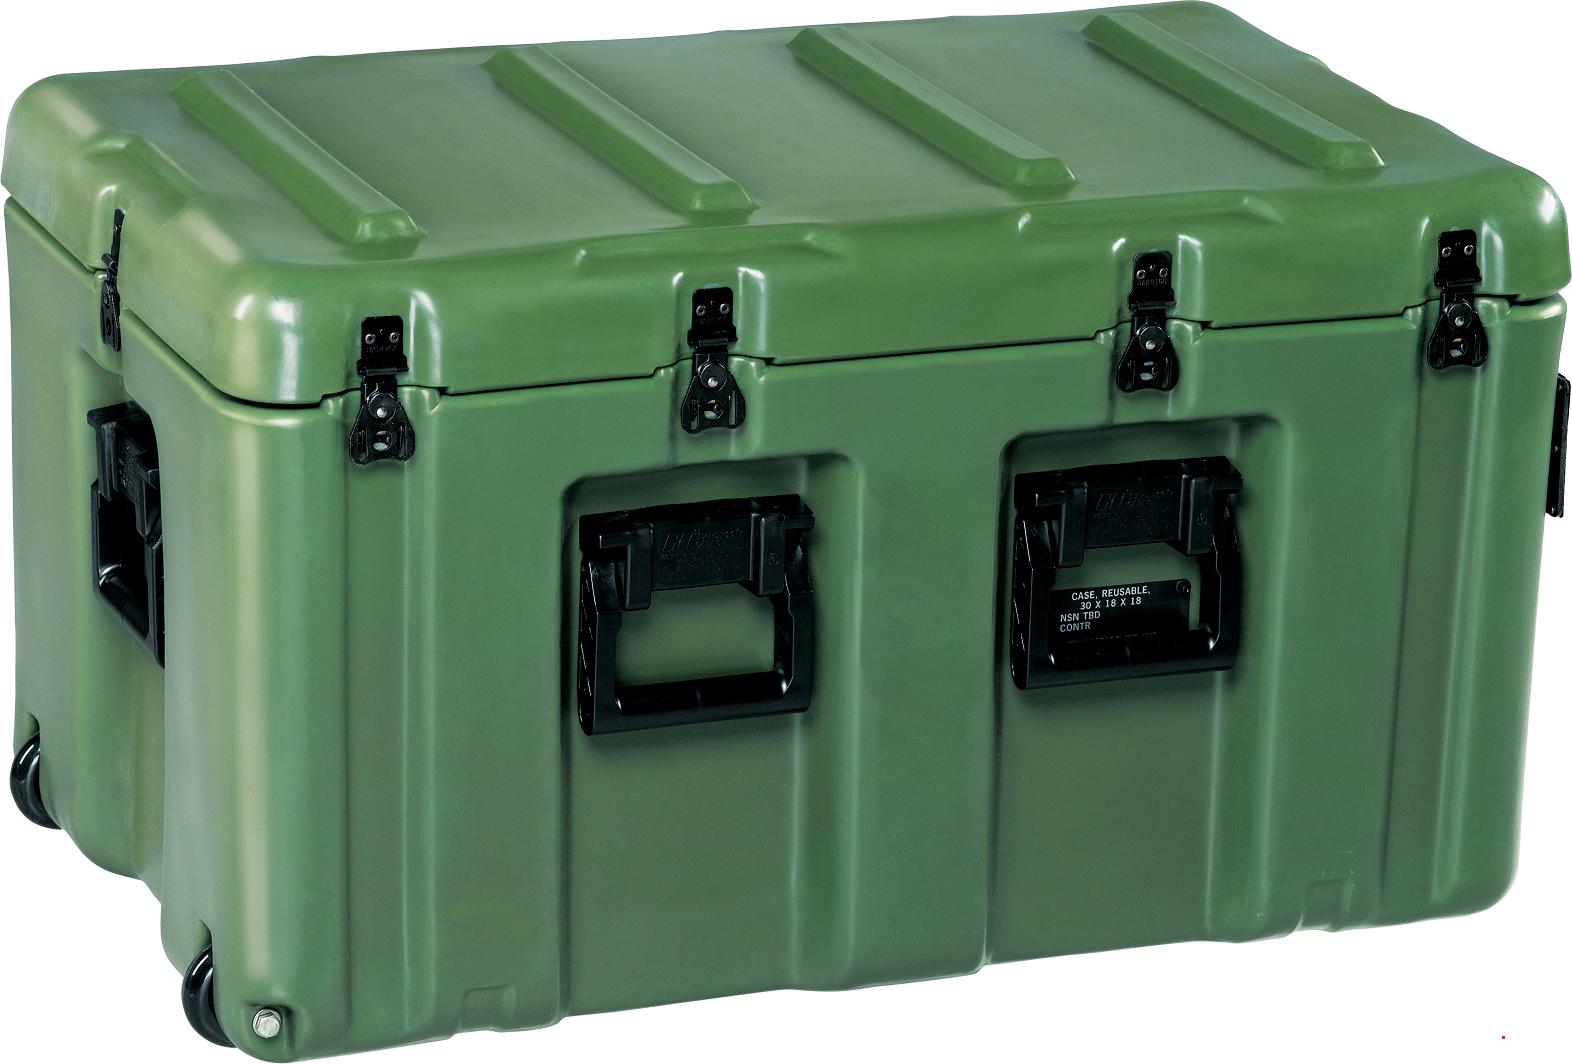 pelican medic military supplies hard case